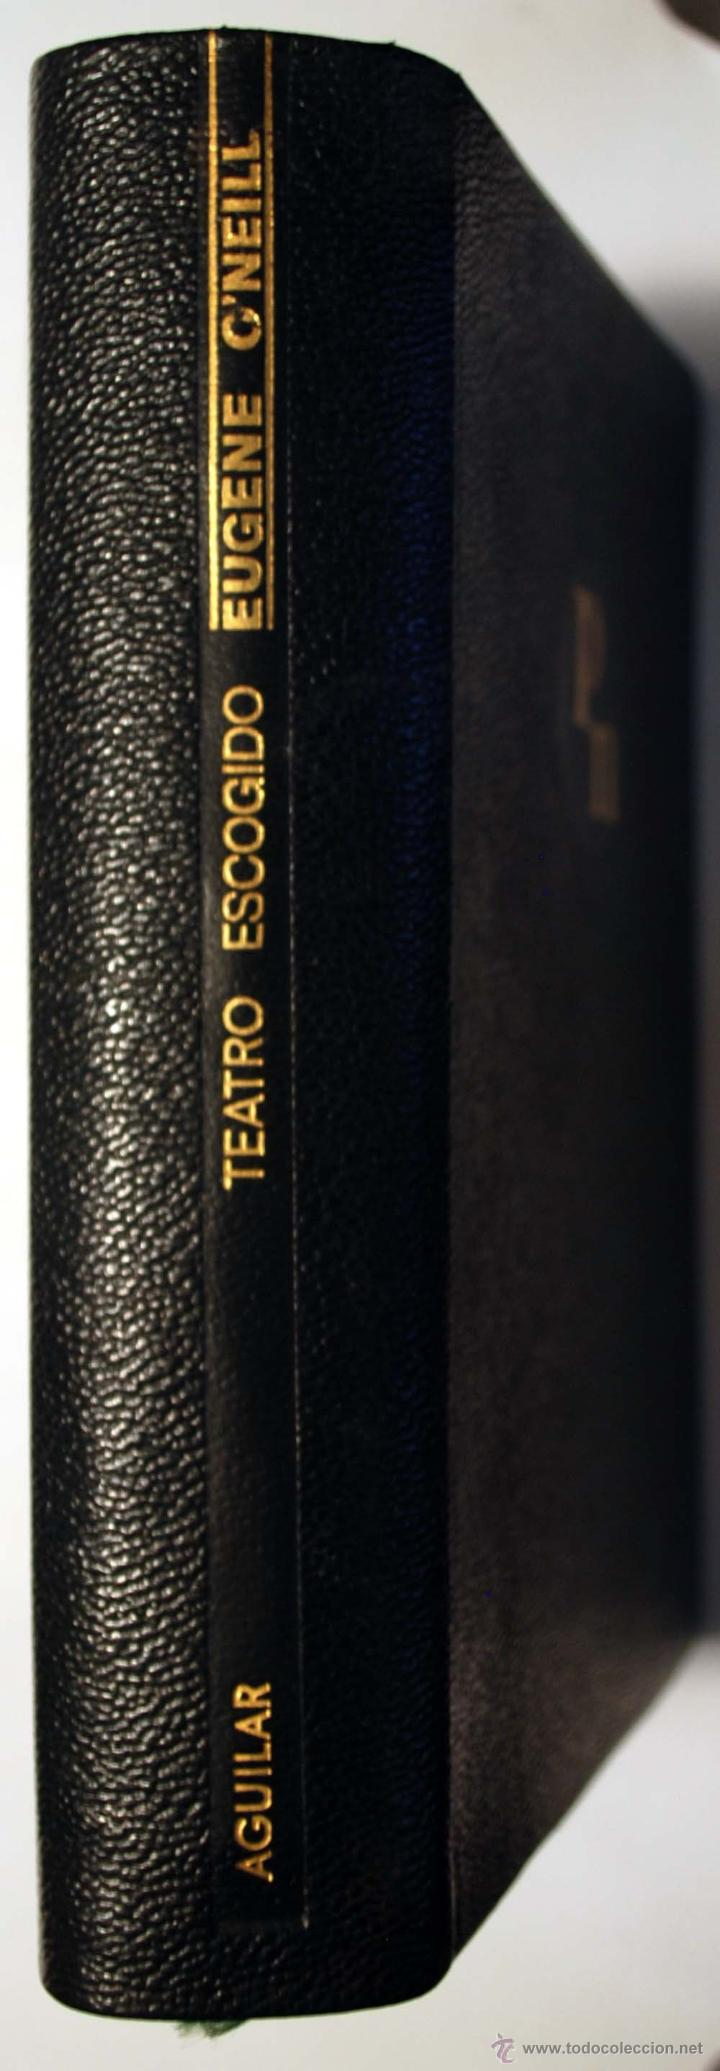 EUGENE O´NEILL. TEATRO ESCOGIDO. AGUILAR. (Libros de Segunda Mano (posteriores a 1936) - Literatura - Narrativa - Otros)